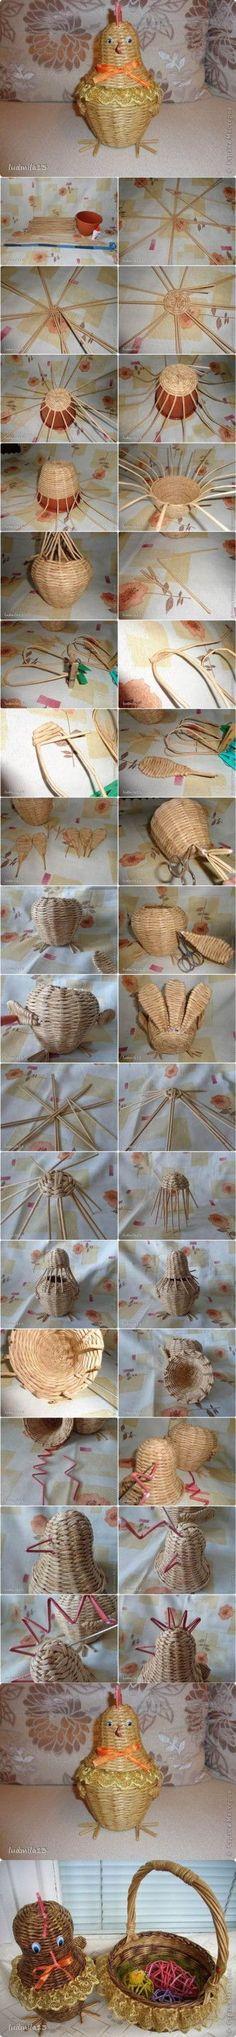 DIY Weaving Paper Chicken Basket 2